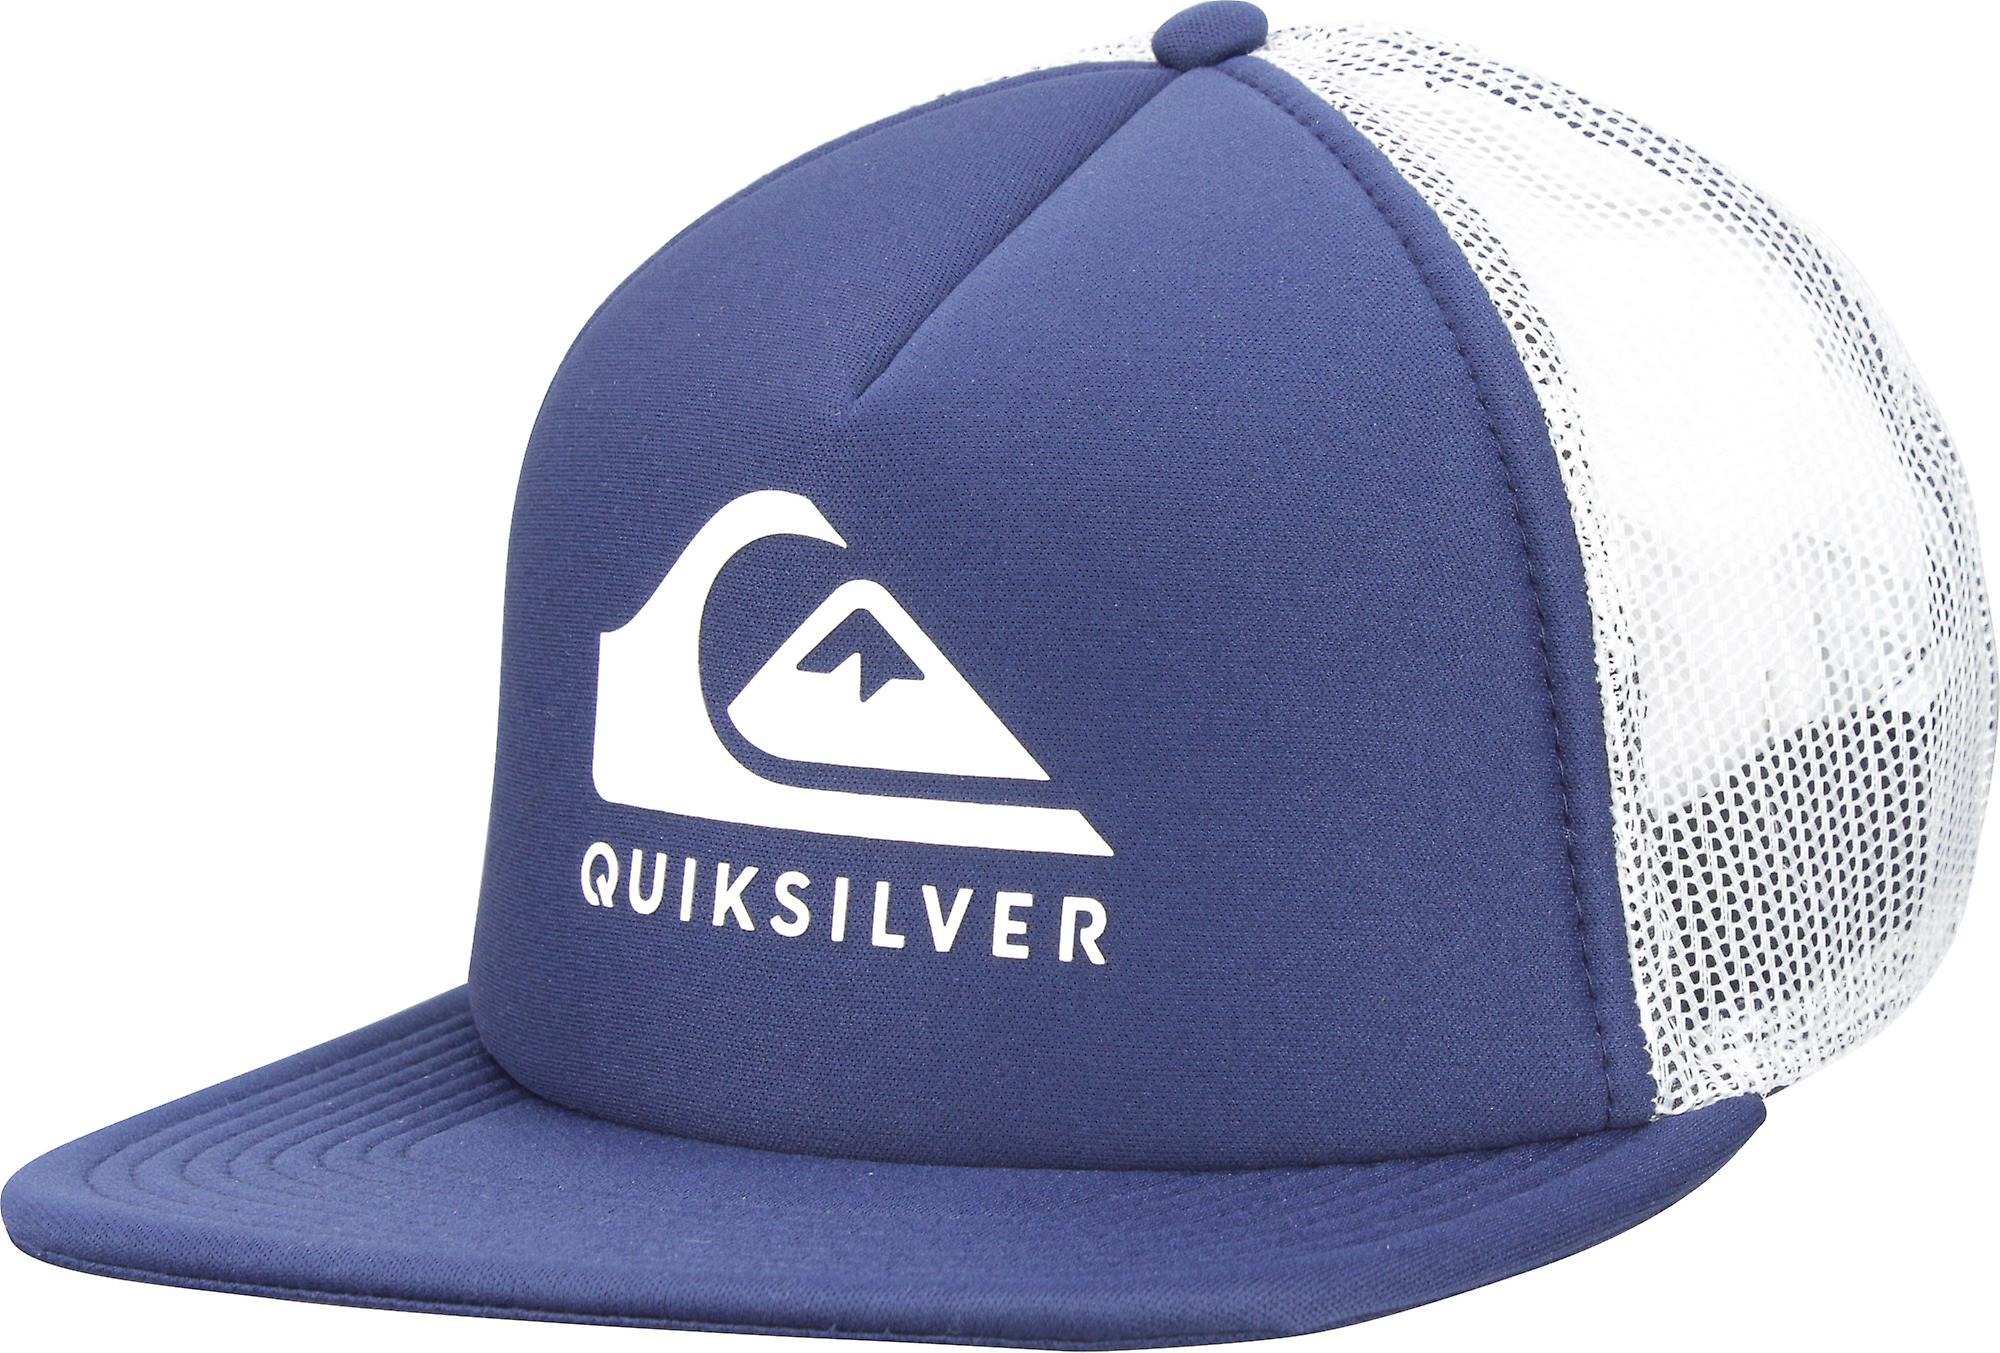 Quiksilver Mens Foamslayer Trucker Hat Hat